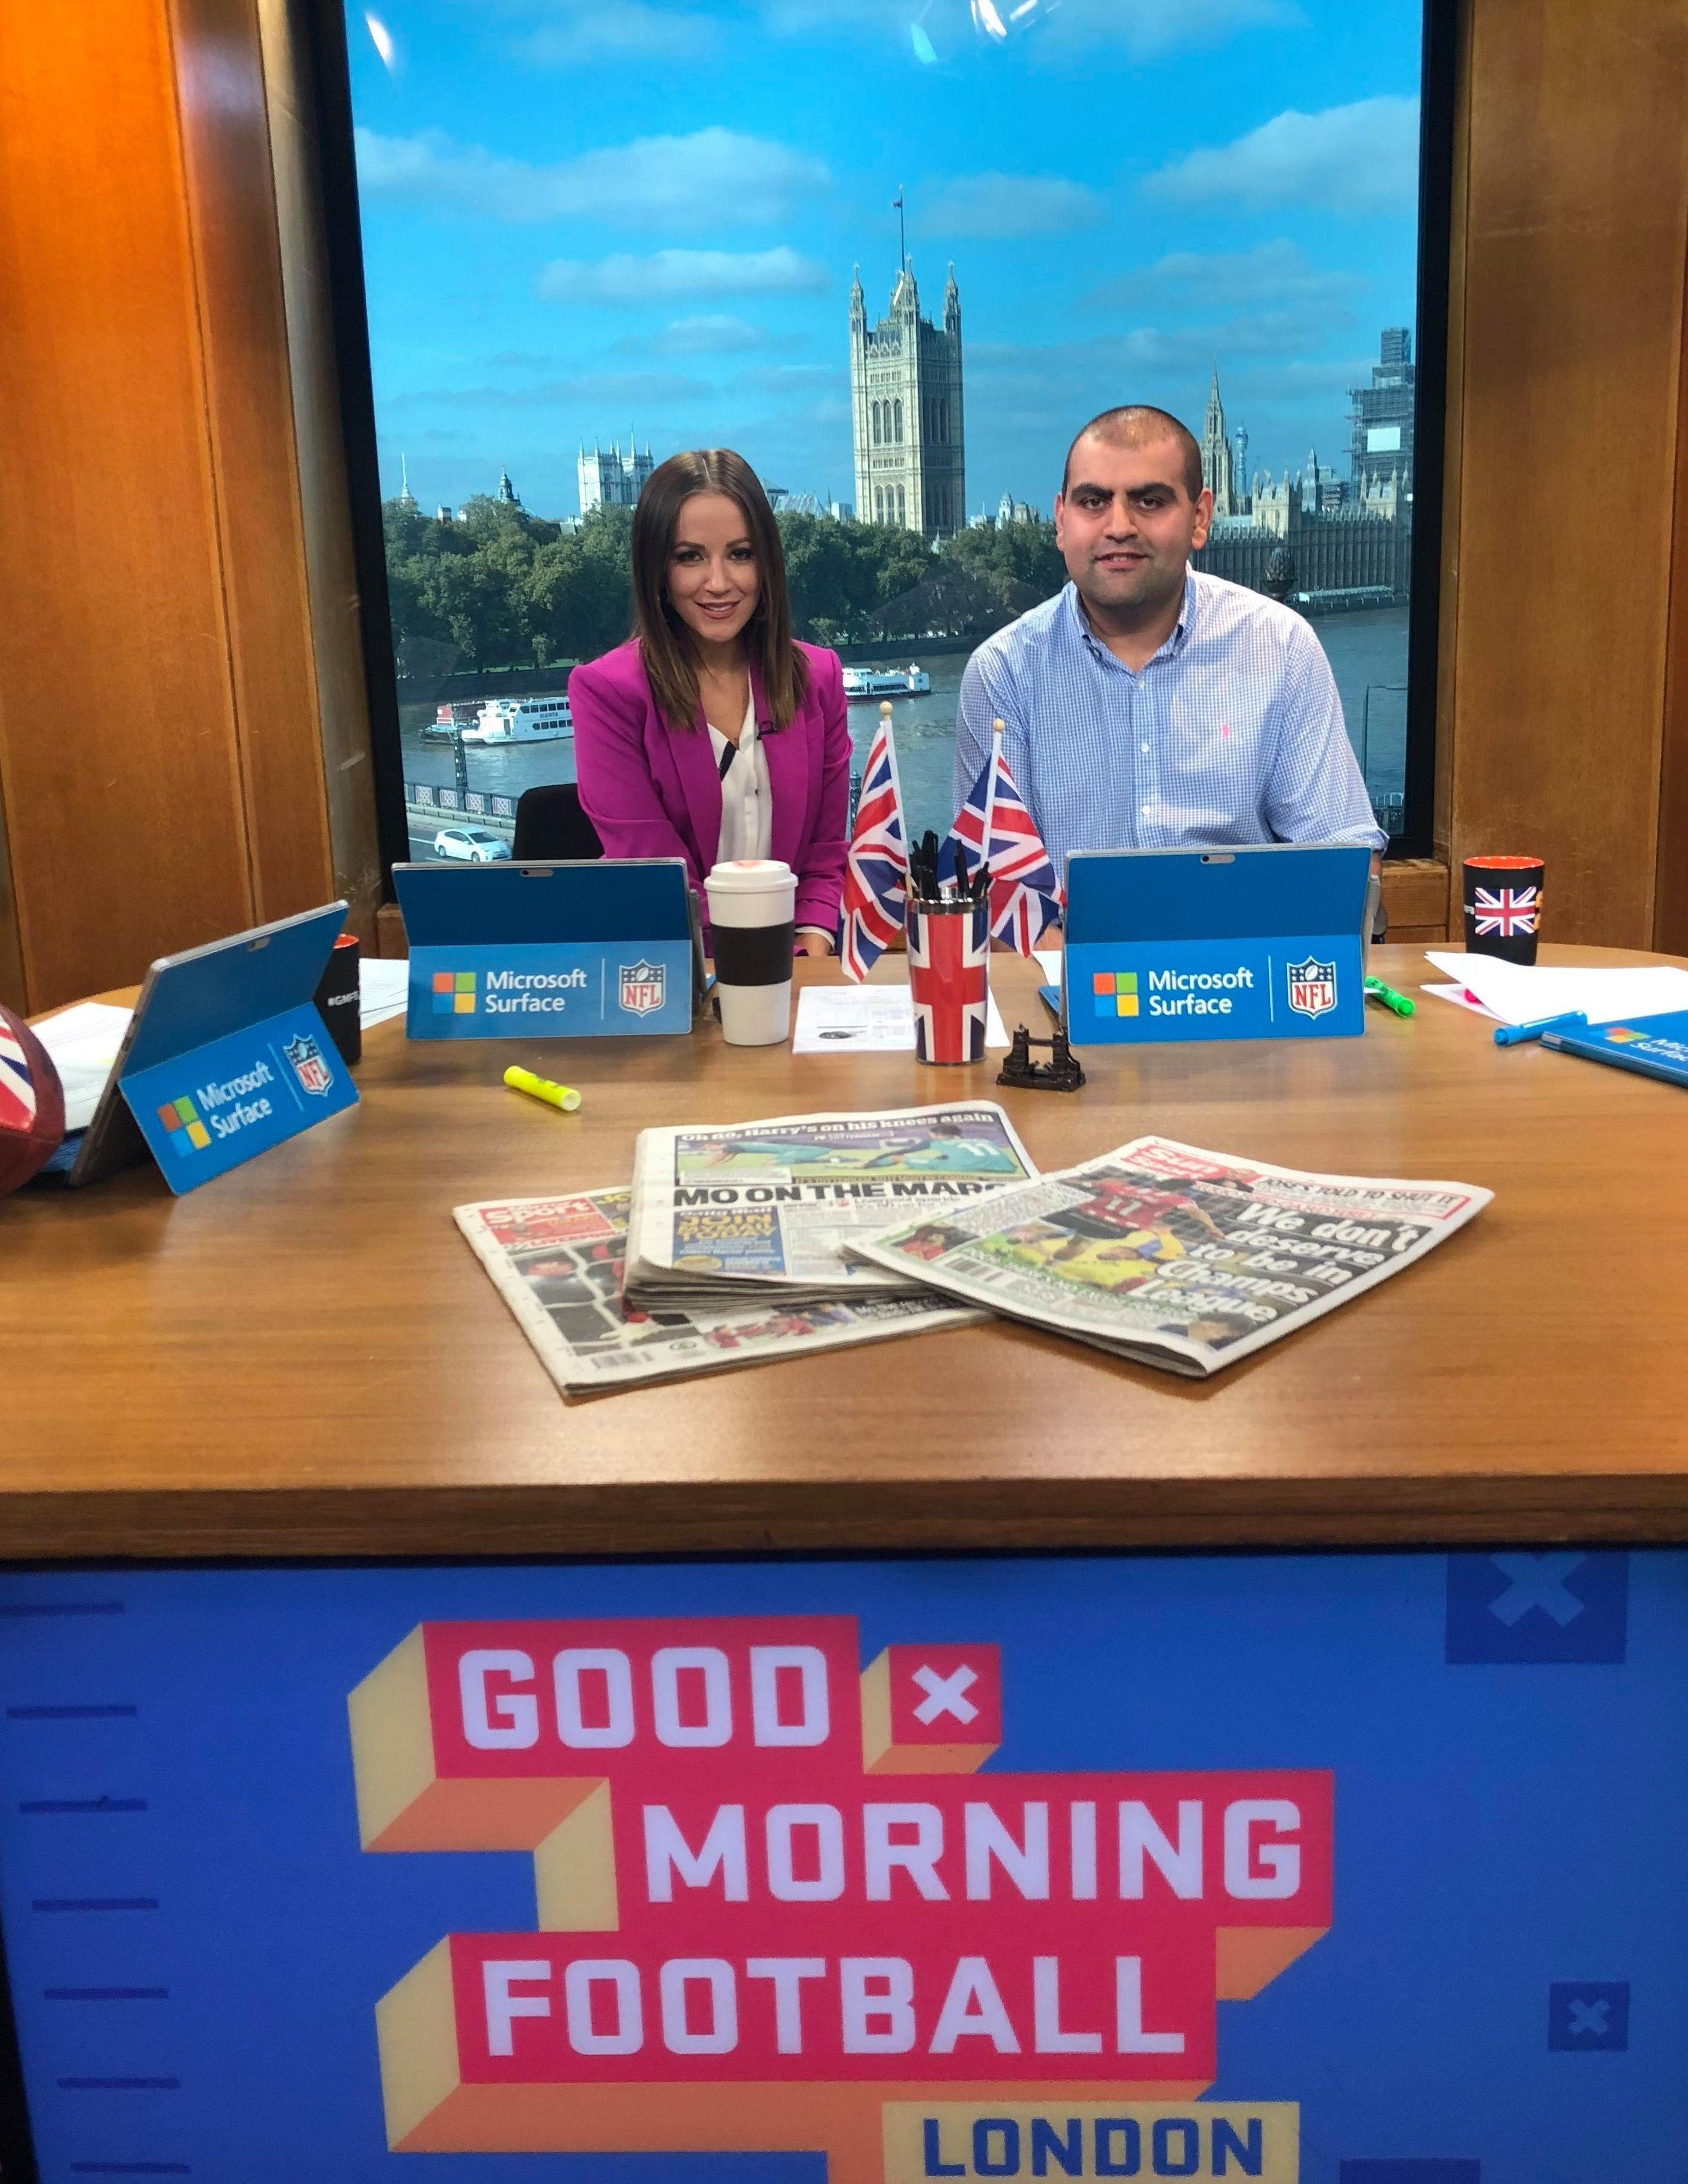 SunSport's Sunni Upal went behind the scenes on Good Morning Football last week